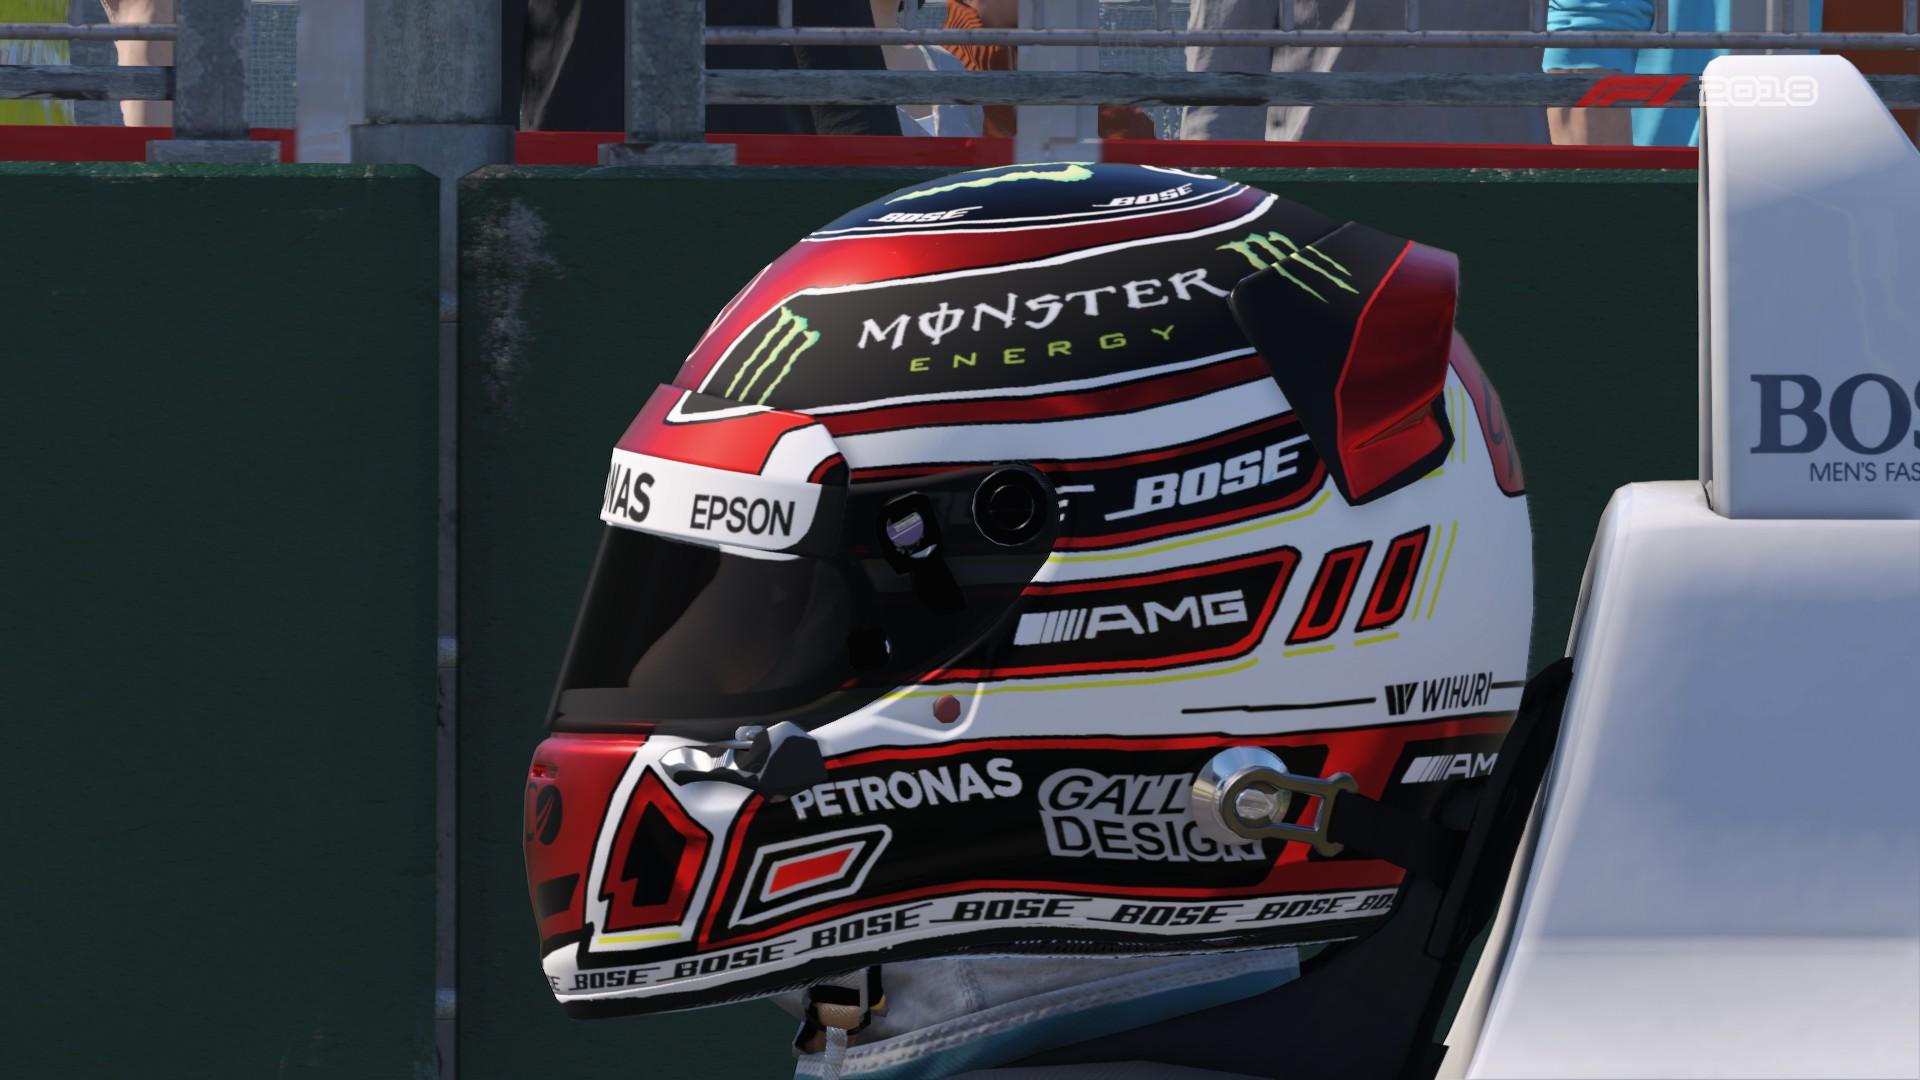 Mercedes Career Helmet 2019 | RaceDepartment - Latest ...